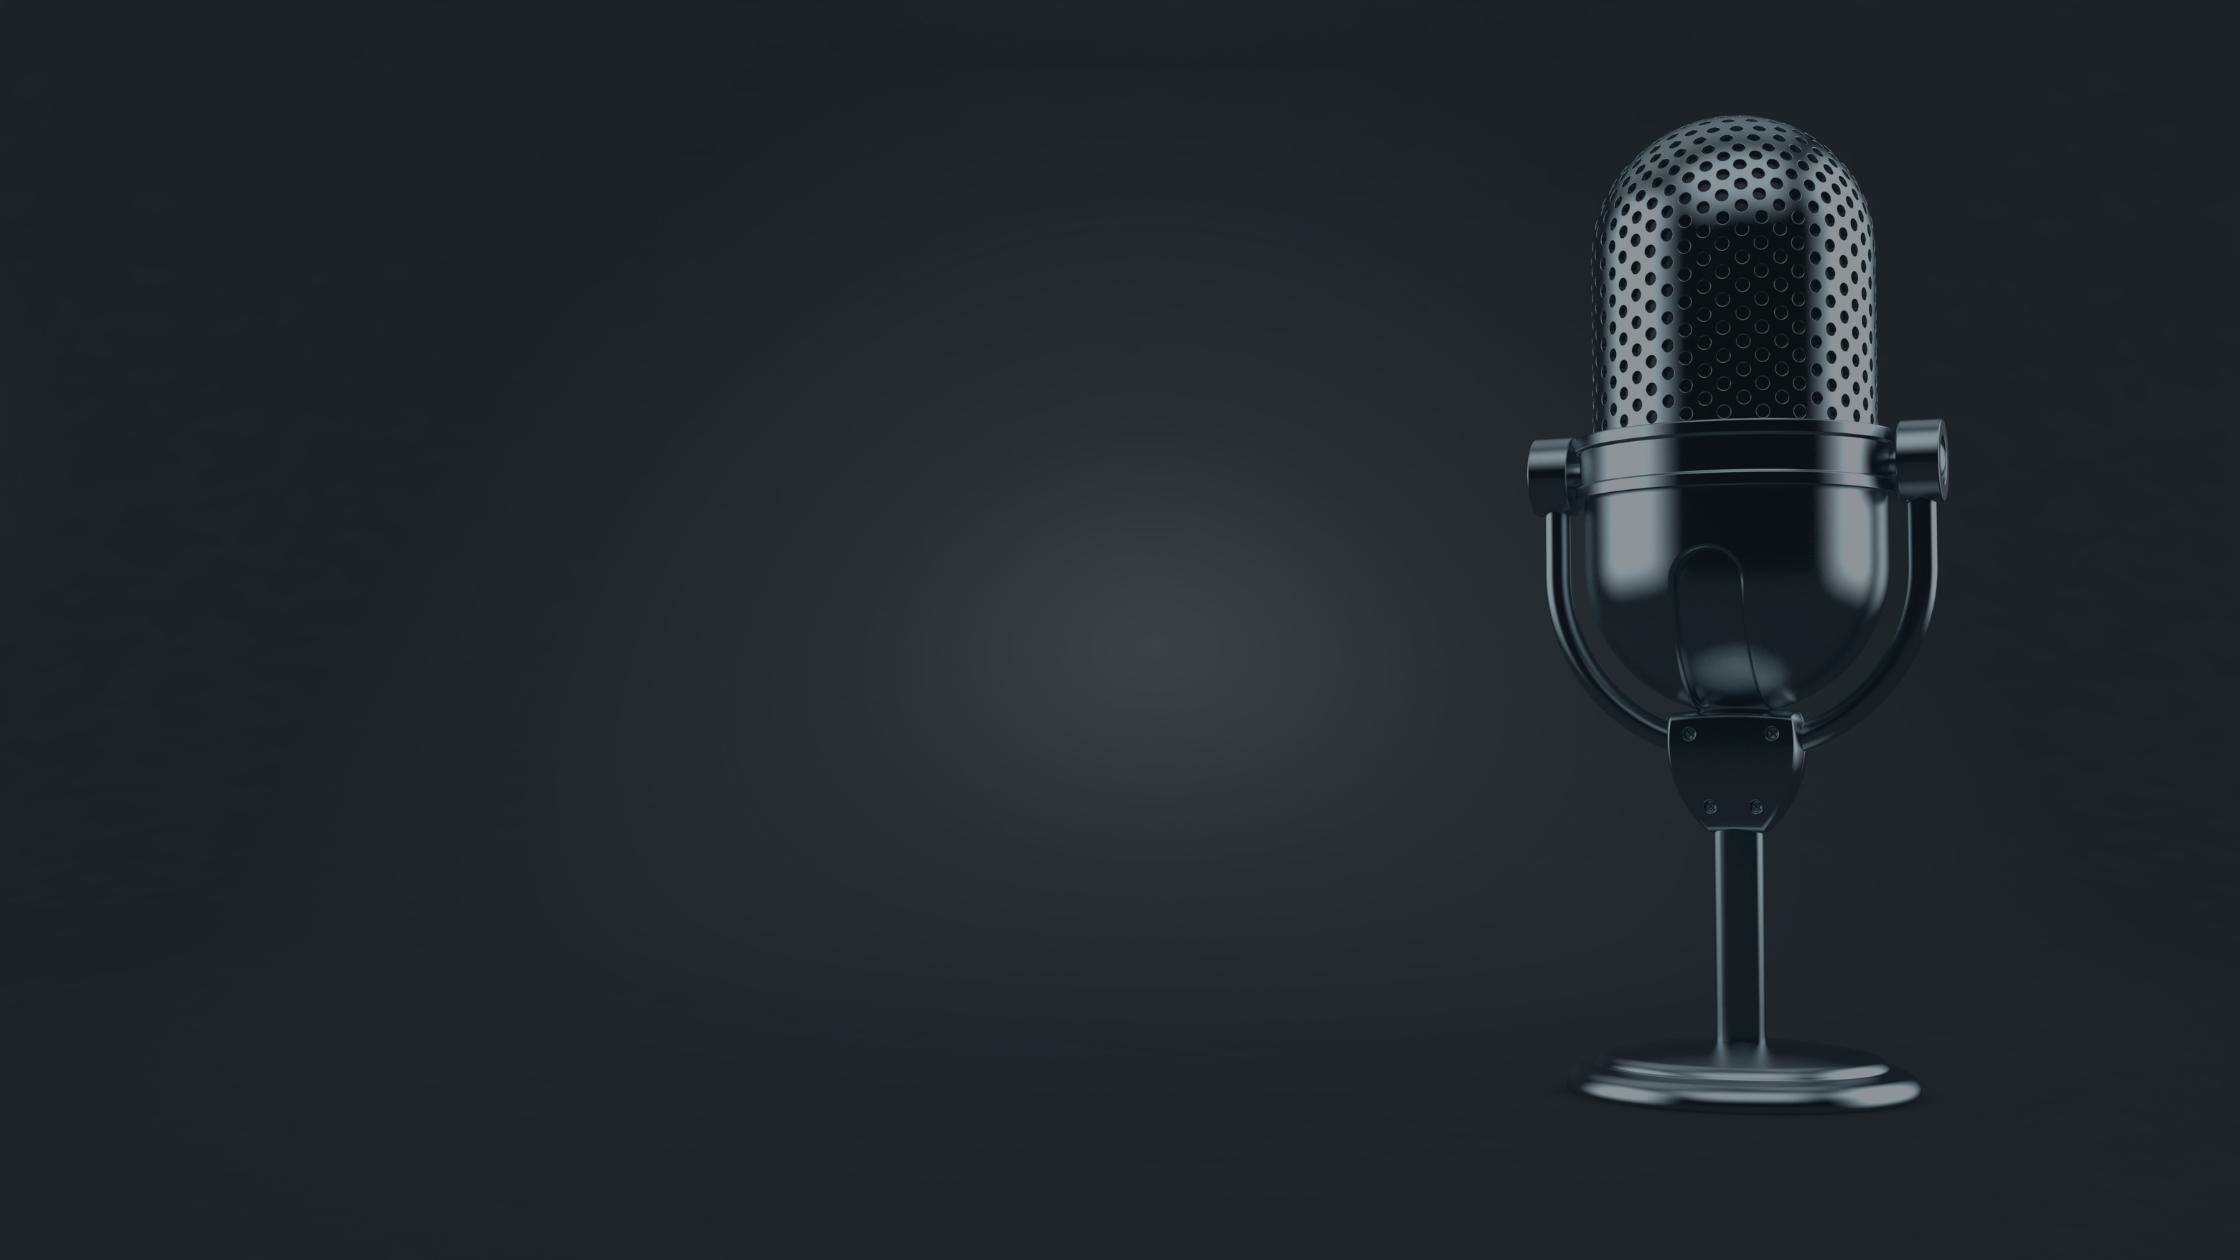 You better werk microphone- Kraken Marketing.